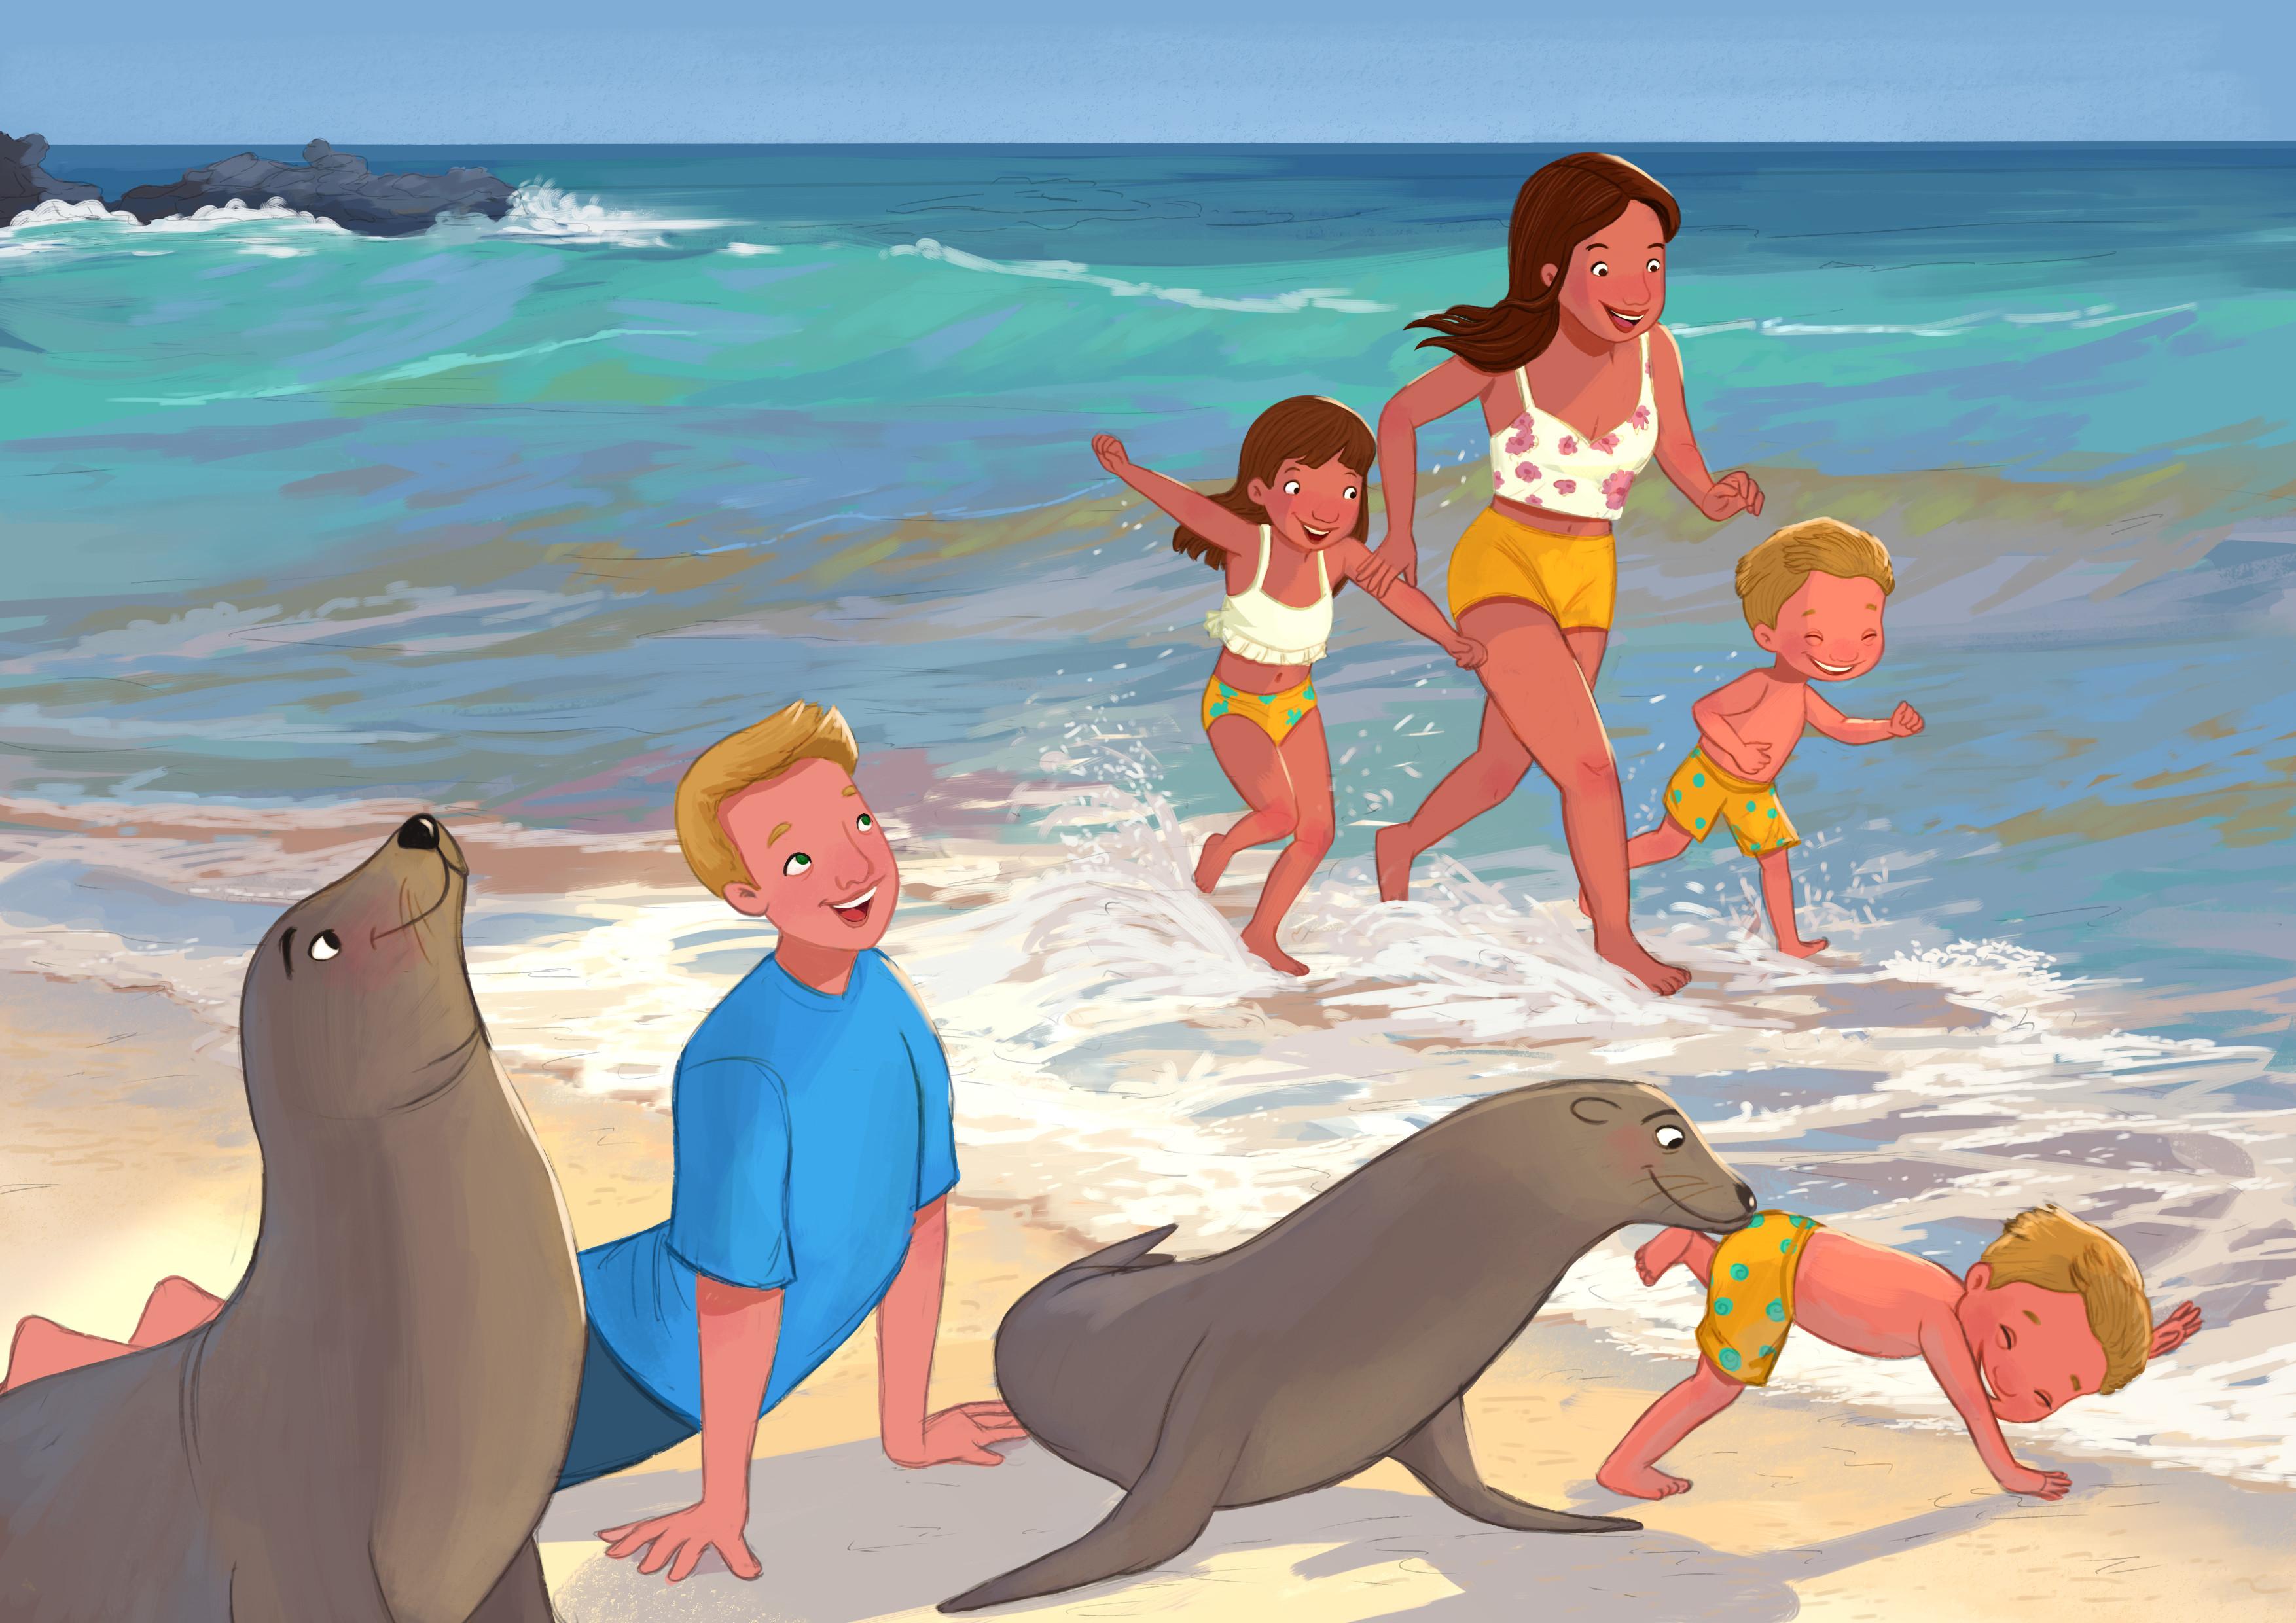 Morning walk in the Galapagos